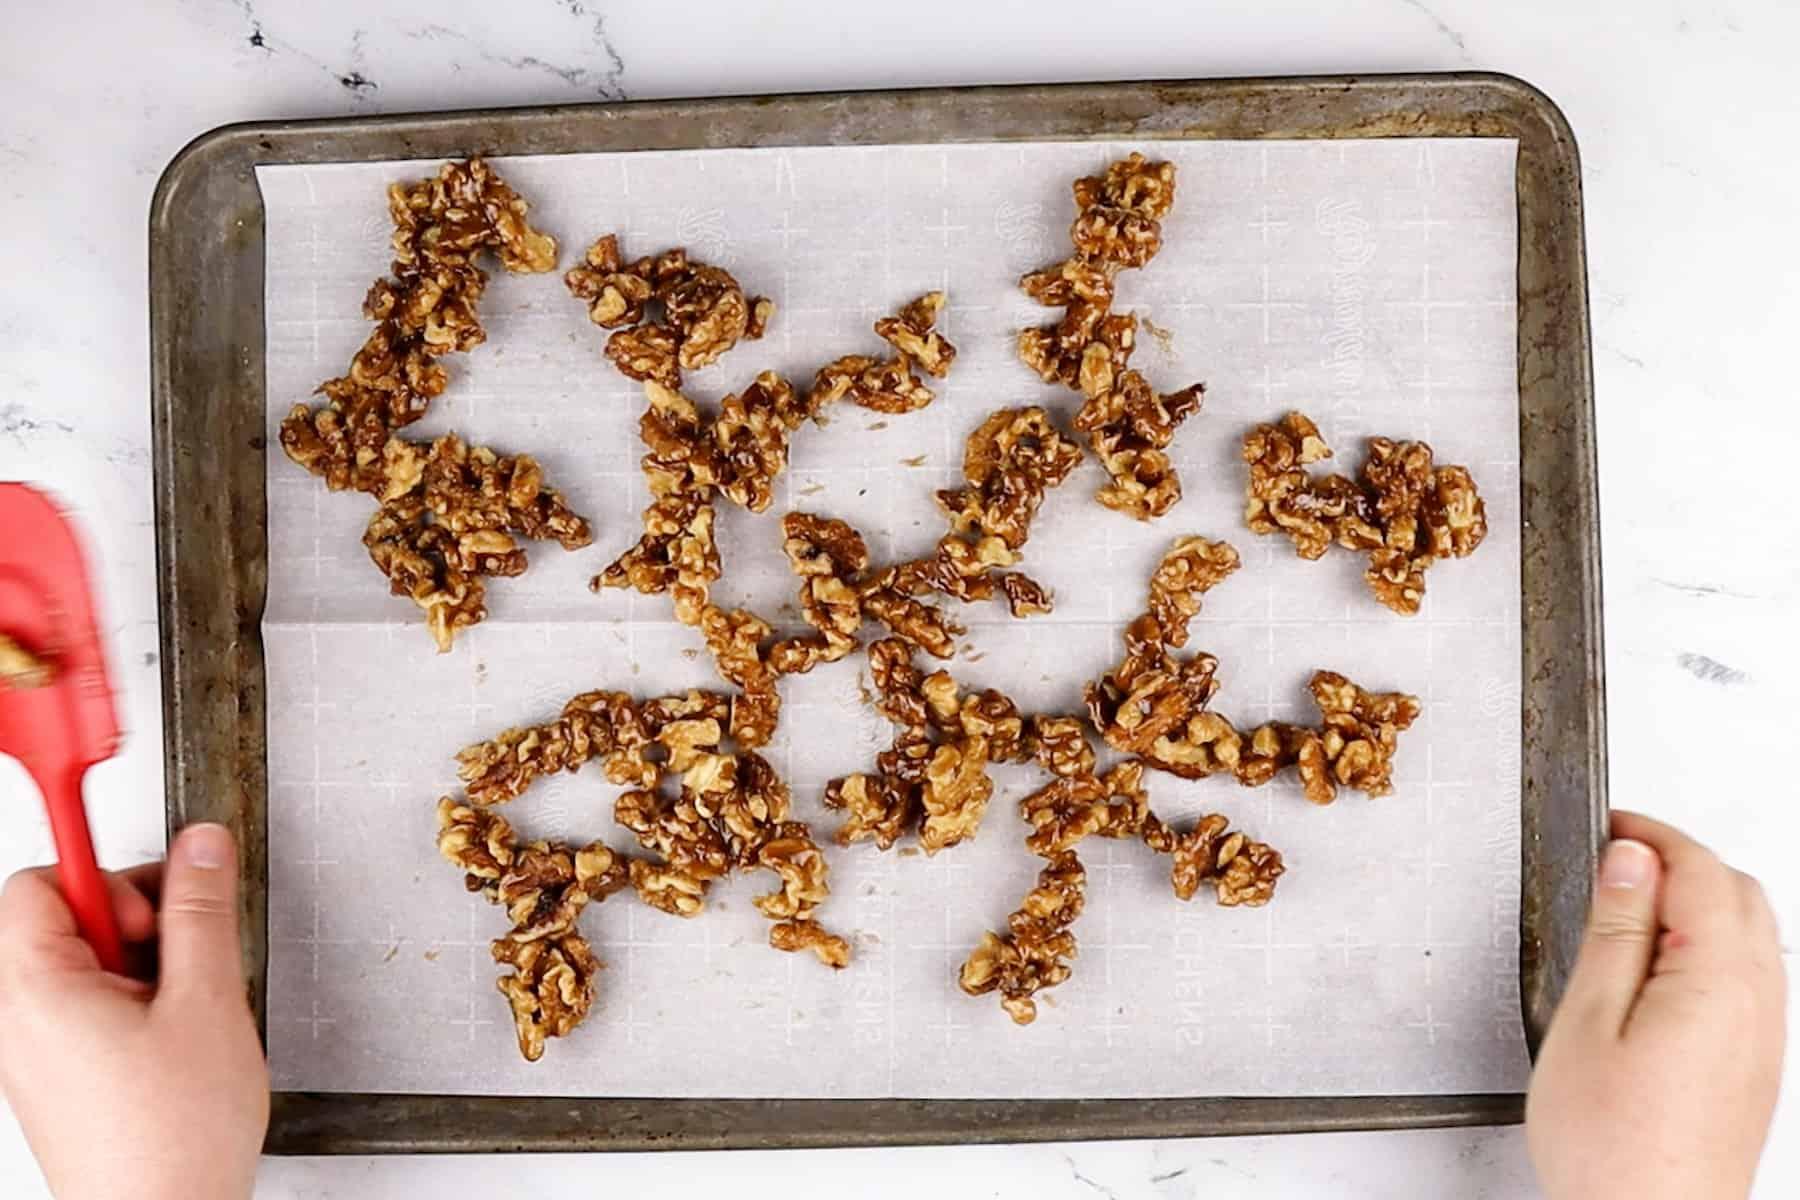 walnuts on baking sheet before baking